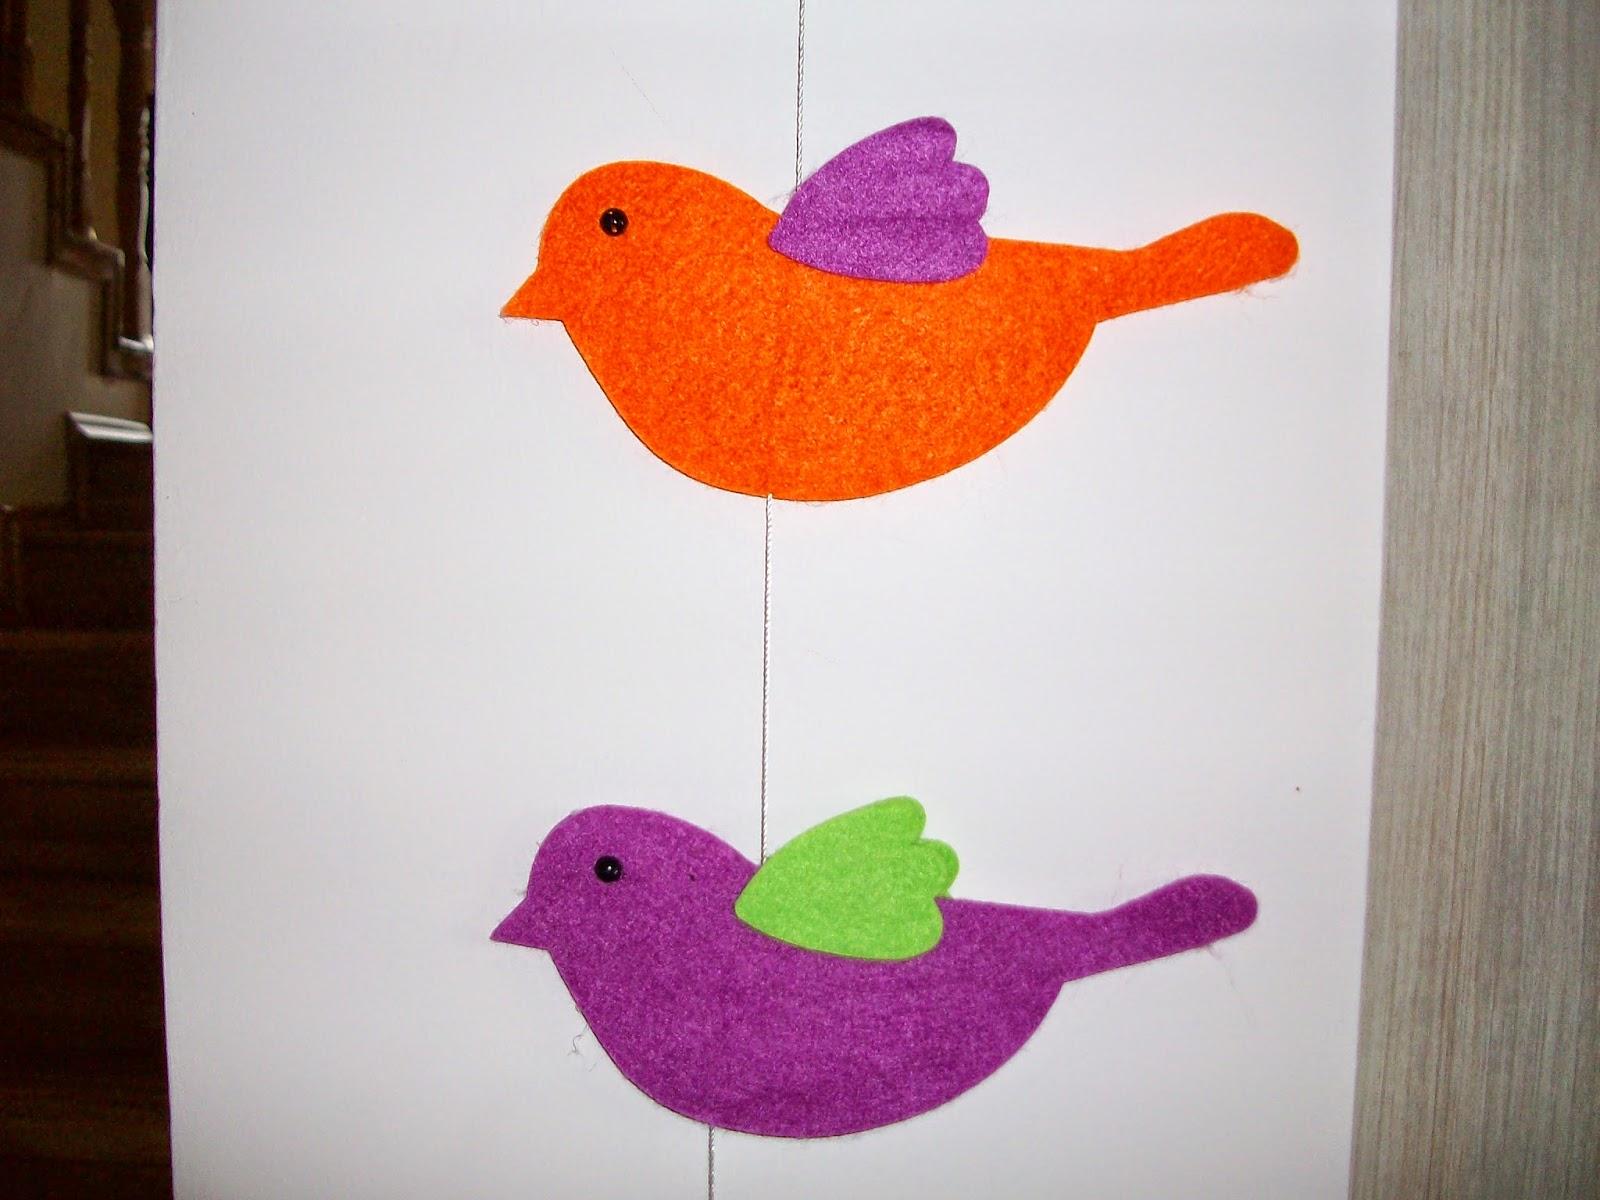 Kartondan Kolay Kuş Yapımı